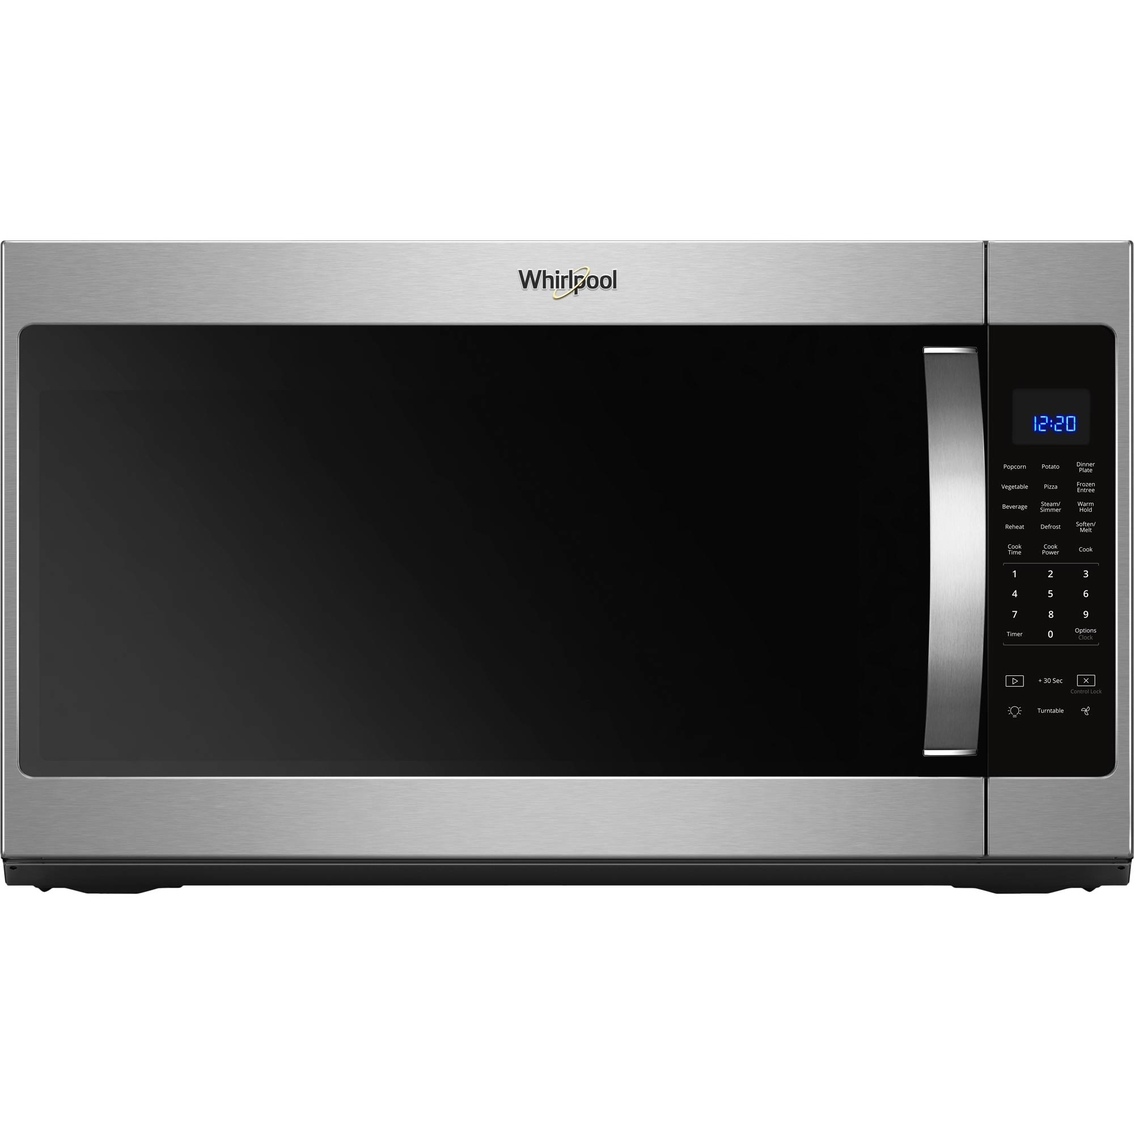 Whirlpool 2 1 Cu Ft Over The Range Microwave Hood